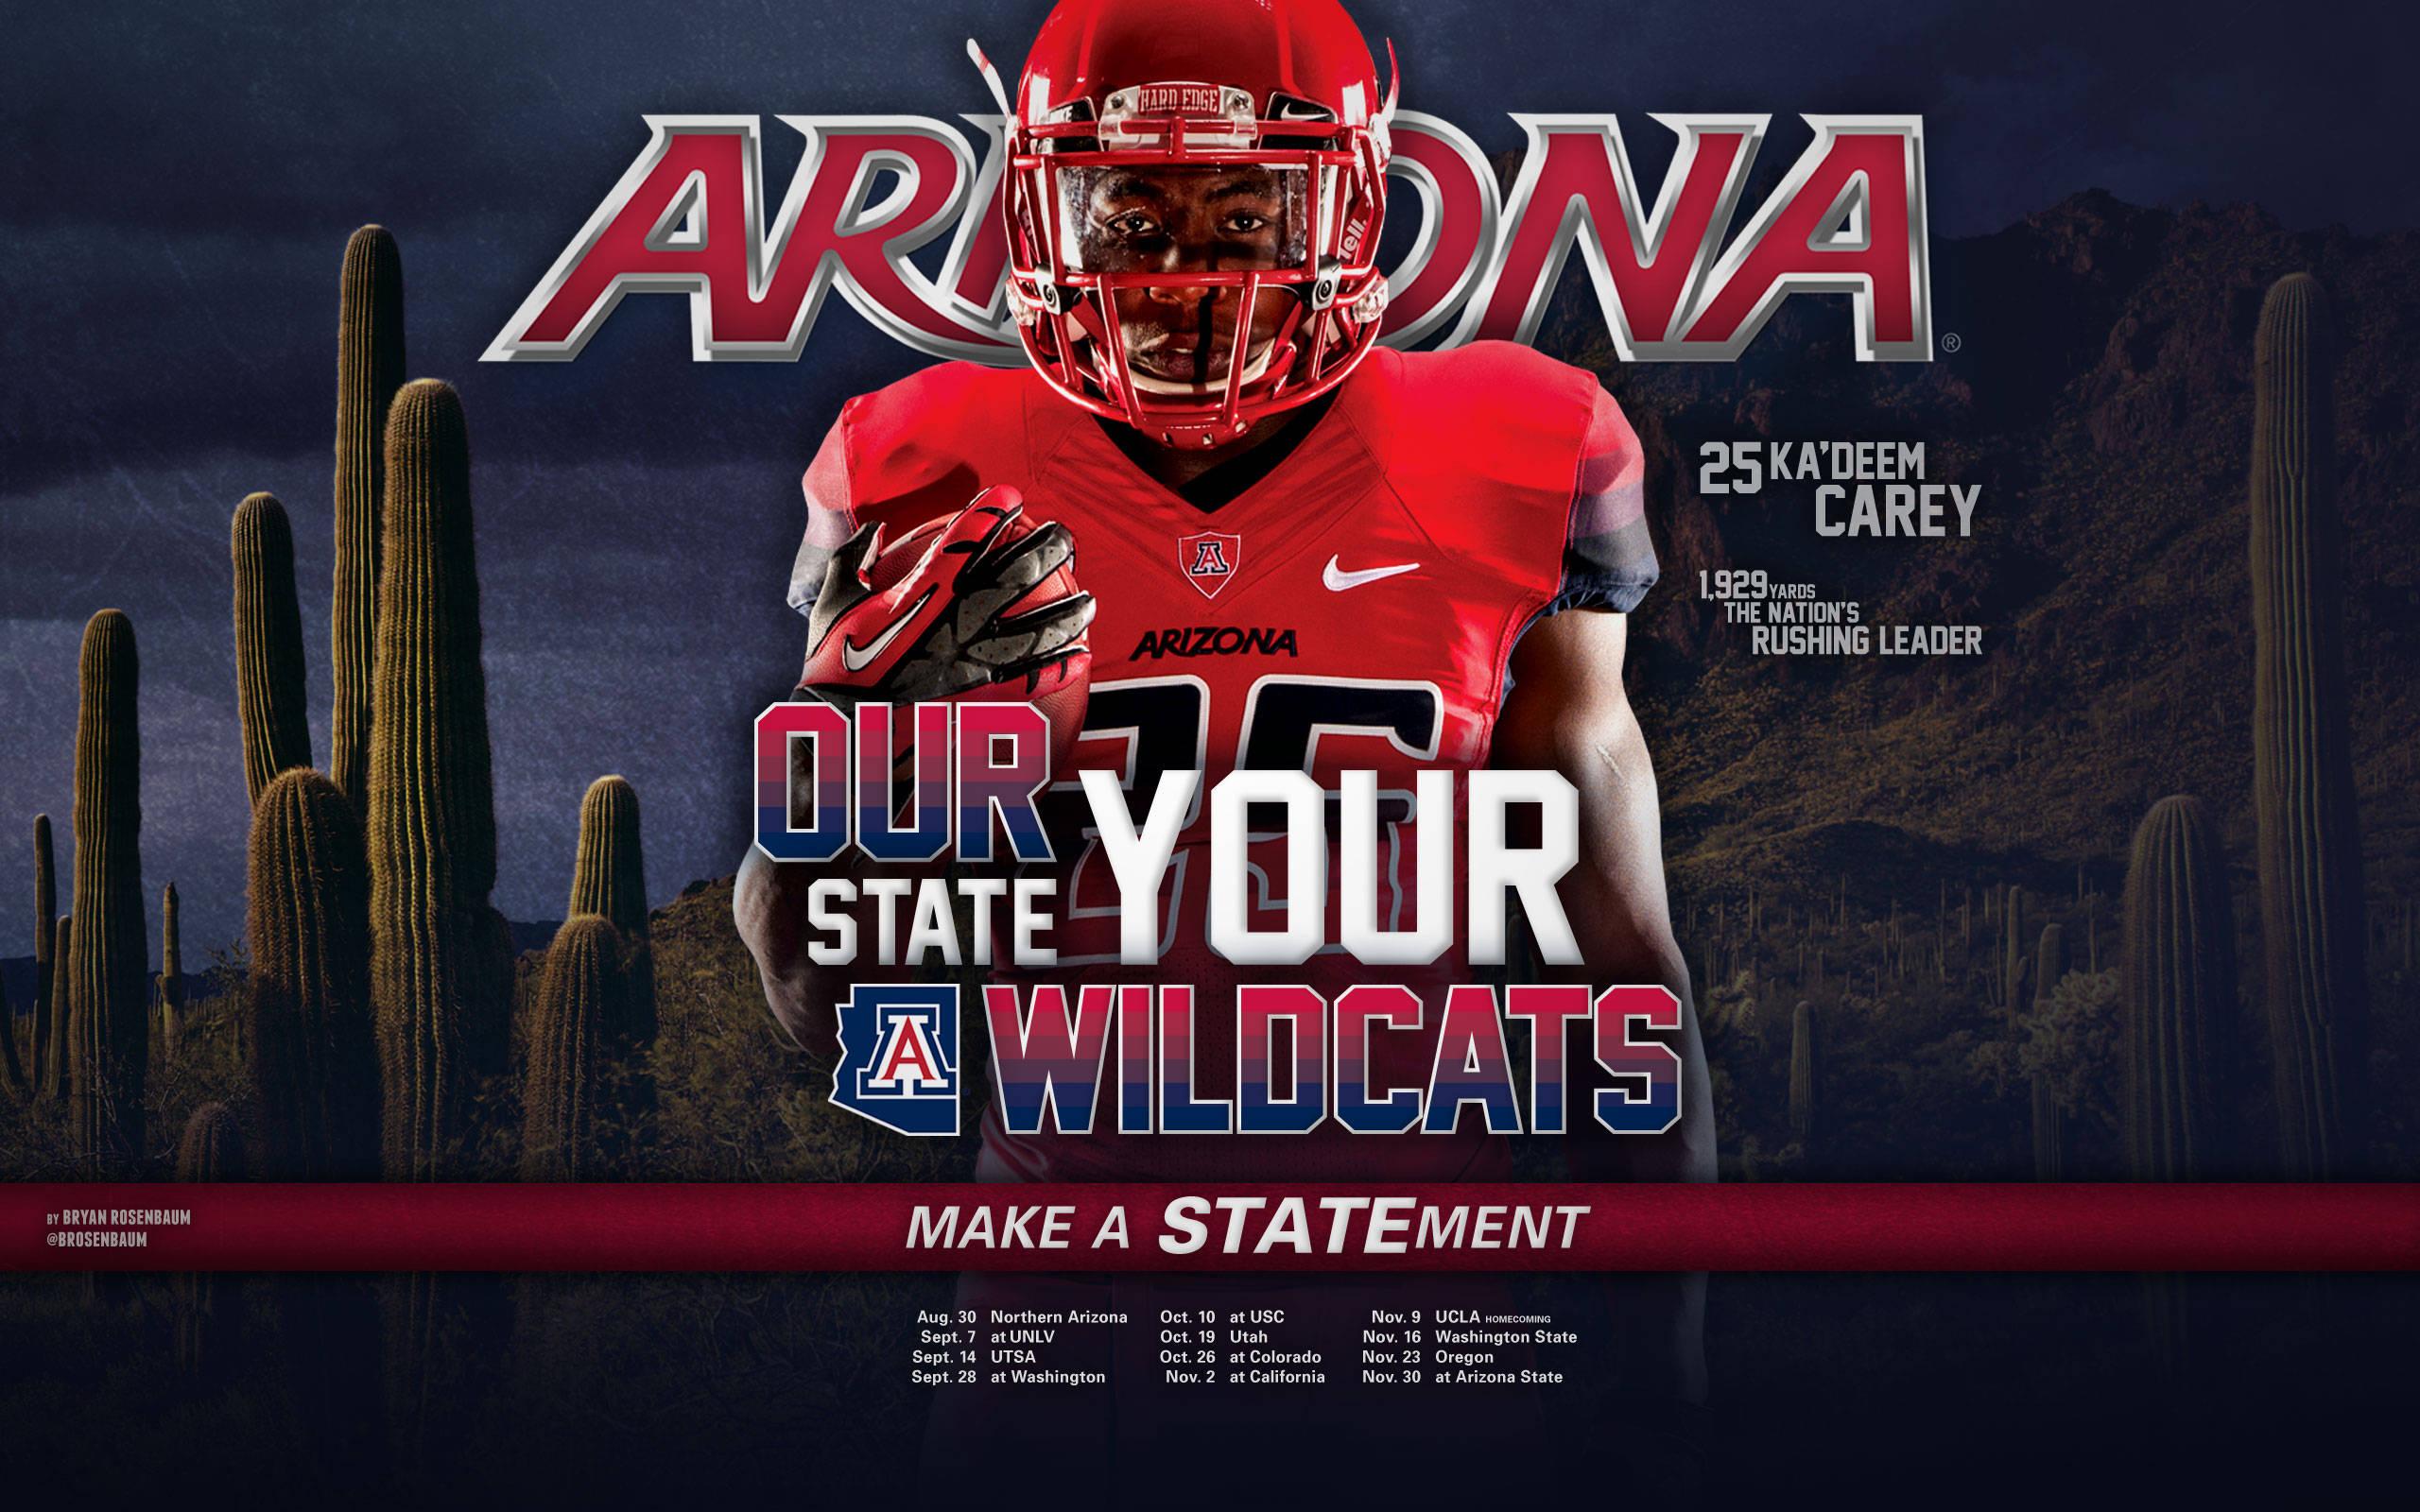 Arizona Wildcats Wallpaper 2012 New Red Pictures 2560x1600